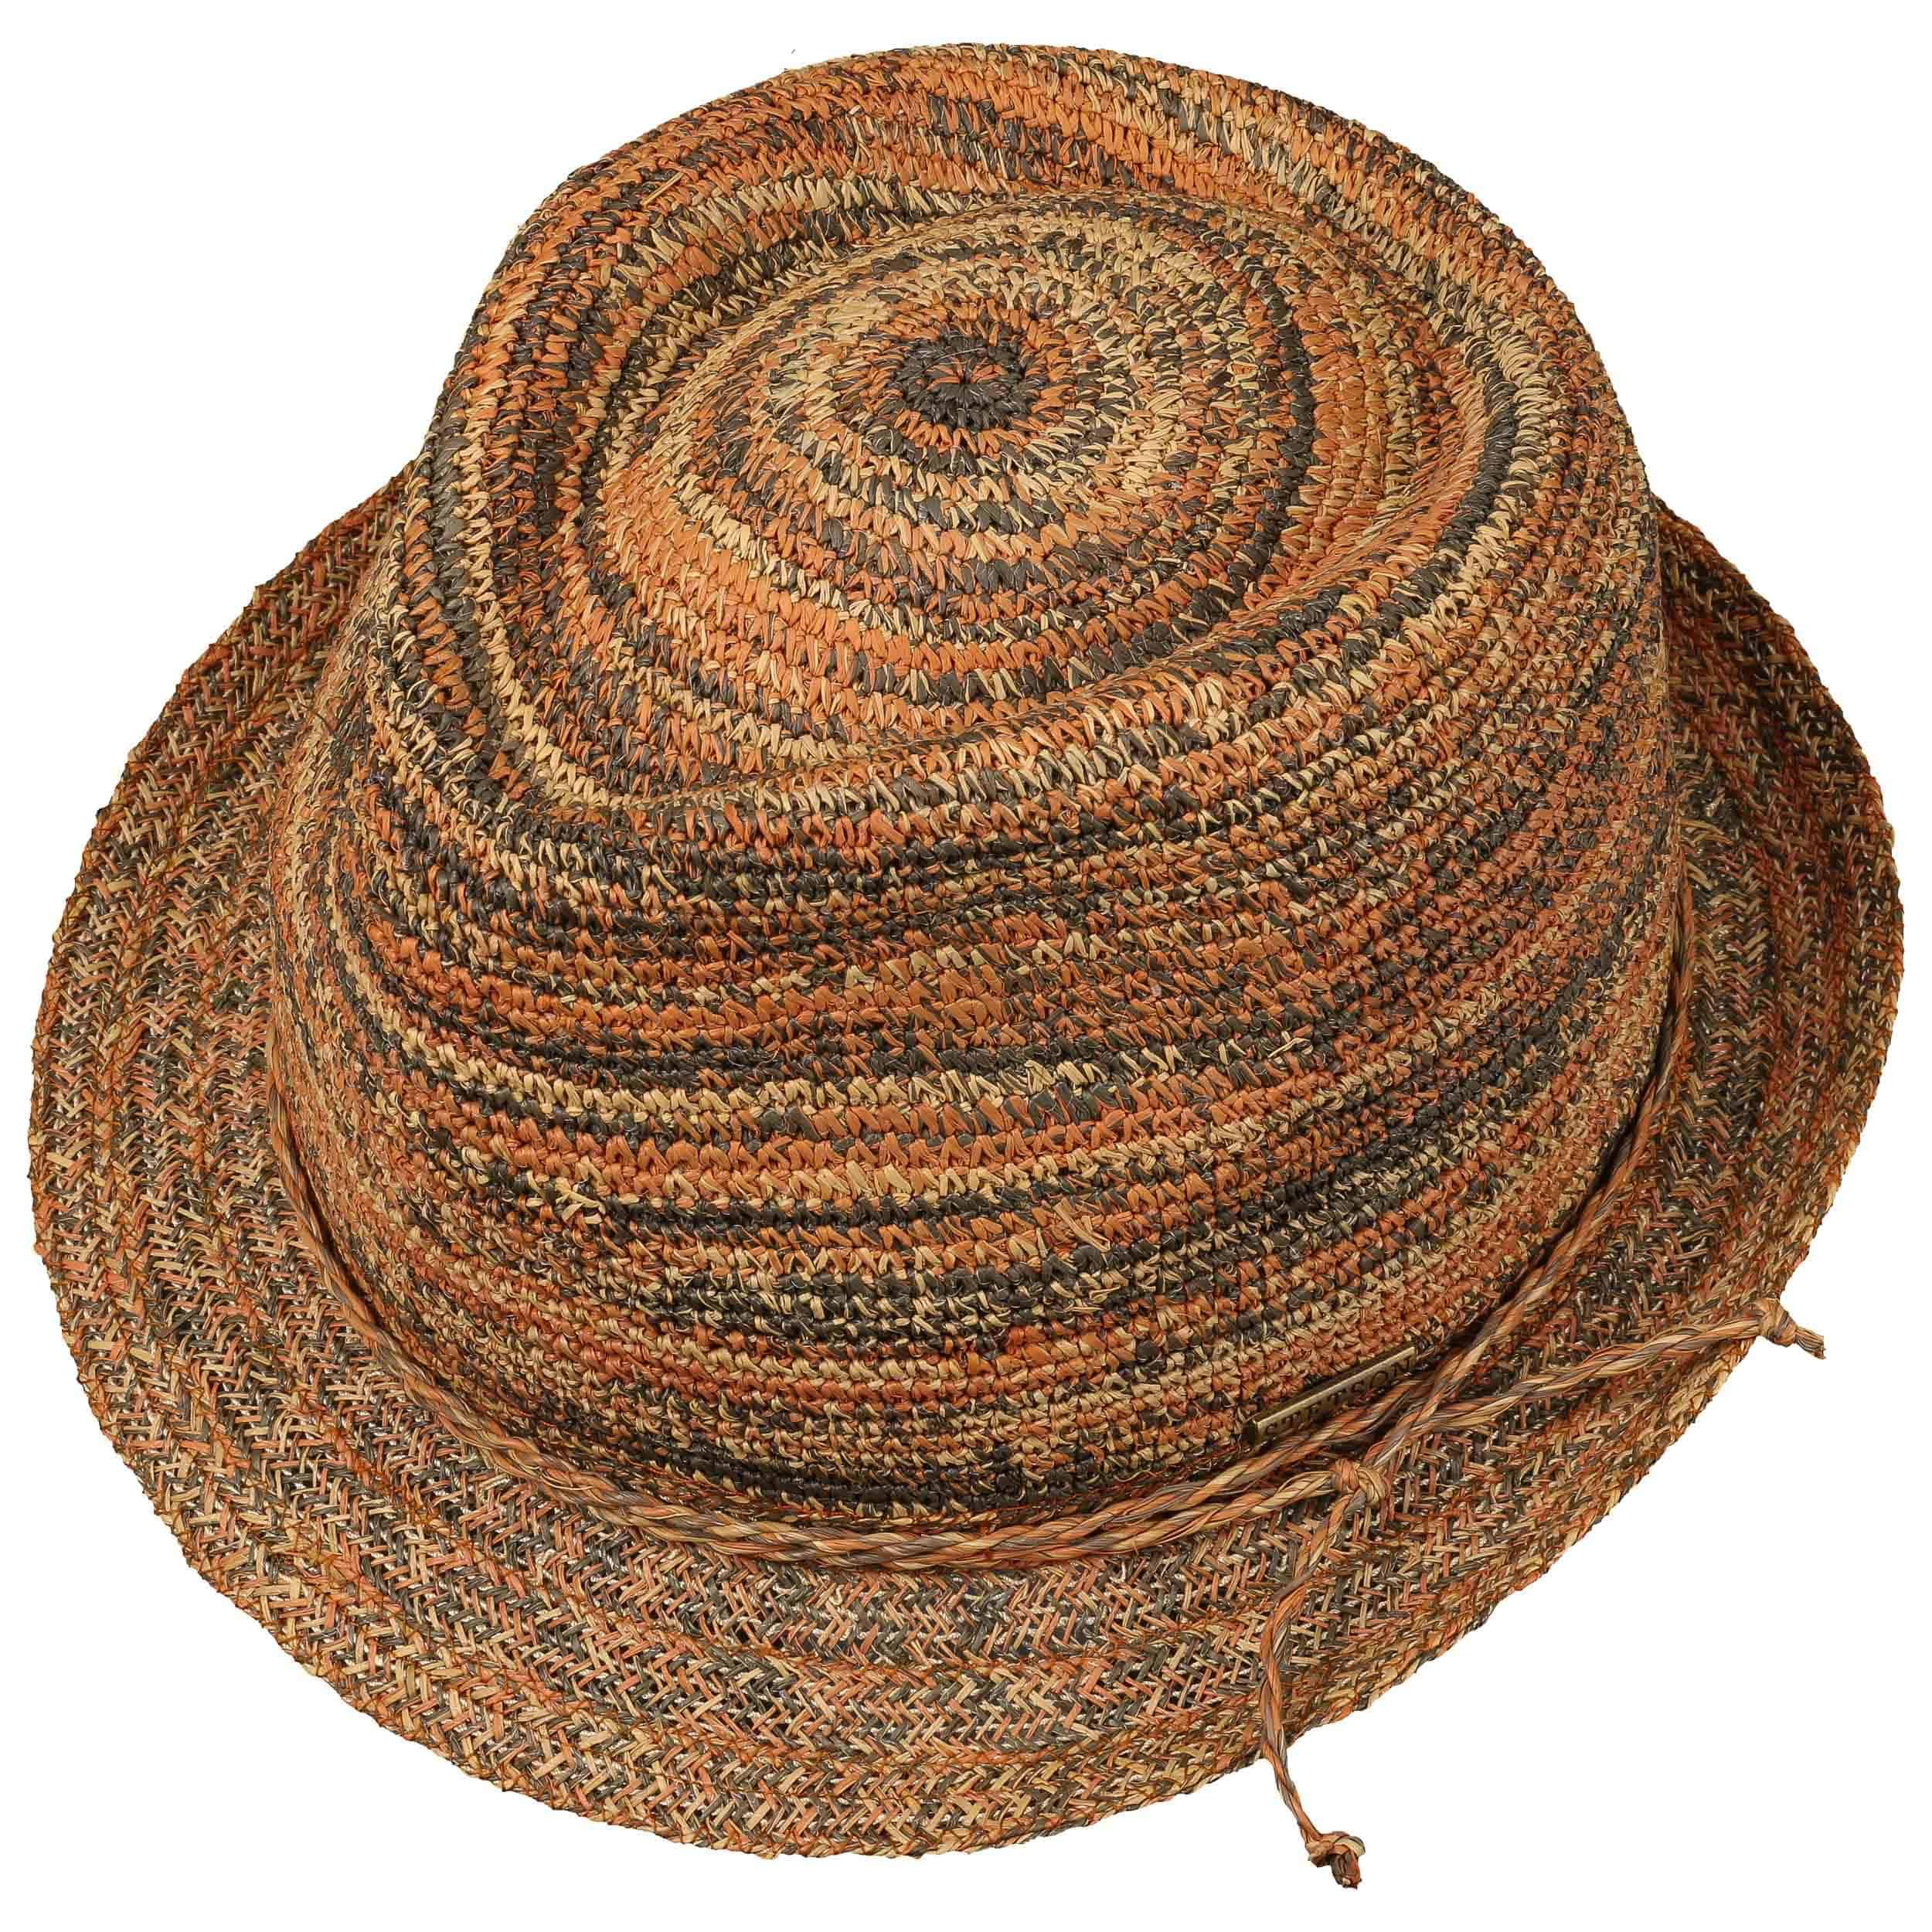 Sombrero Raffia Crochet Trilby by Stetson - Sombreros - sombreroshop.es 7833fe51371